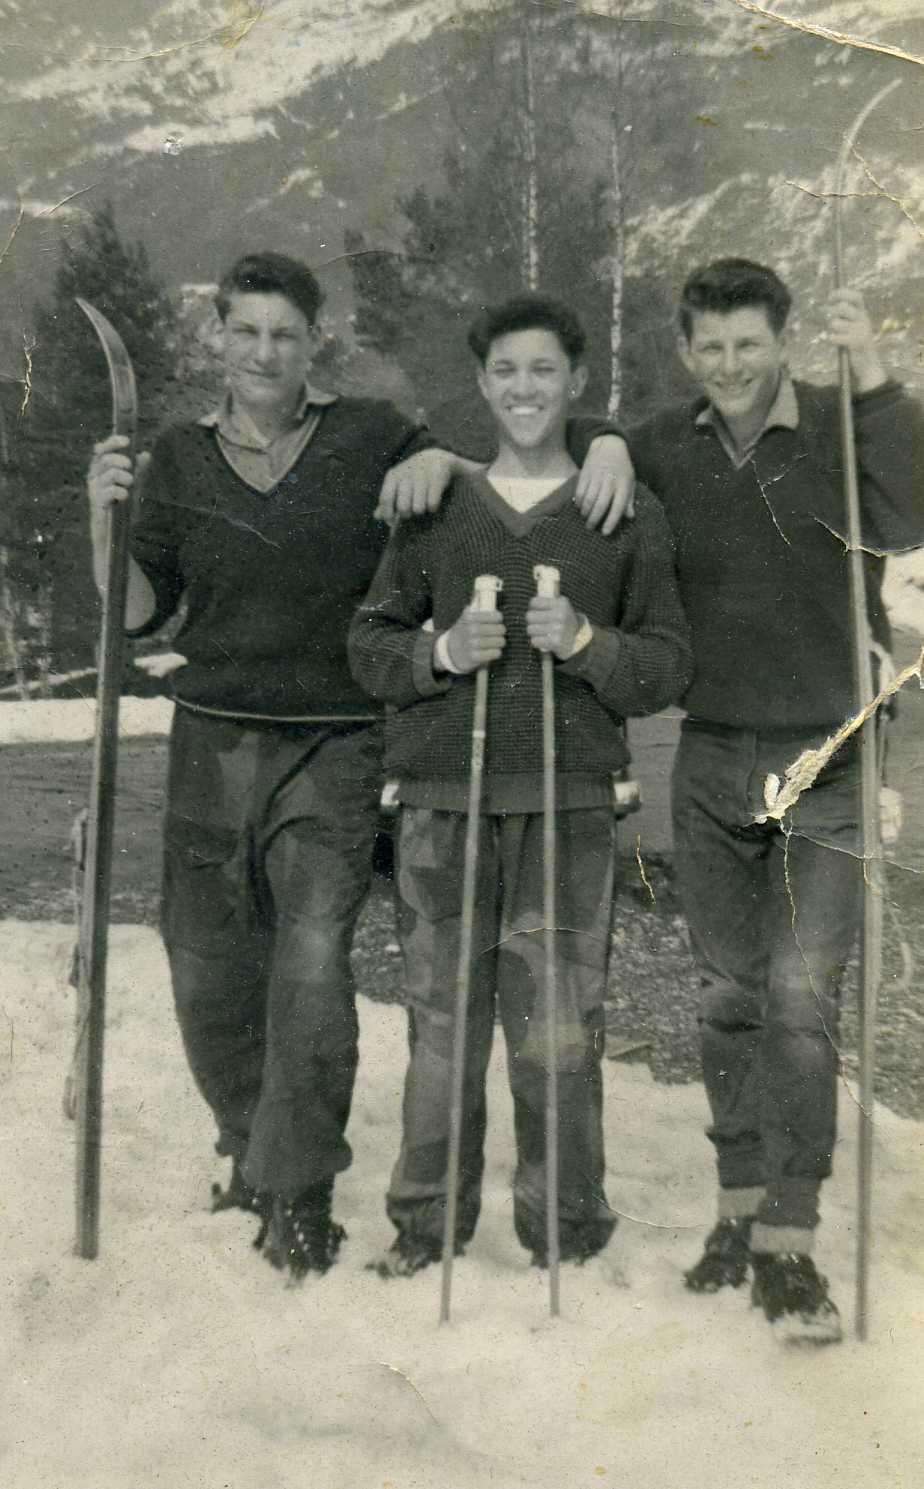 skiing-at-16-years-old